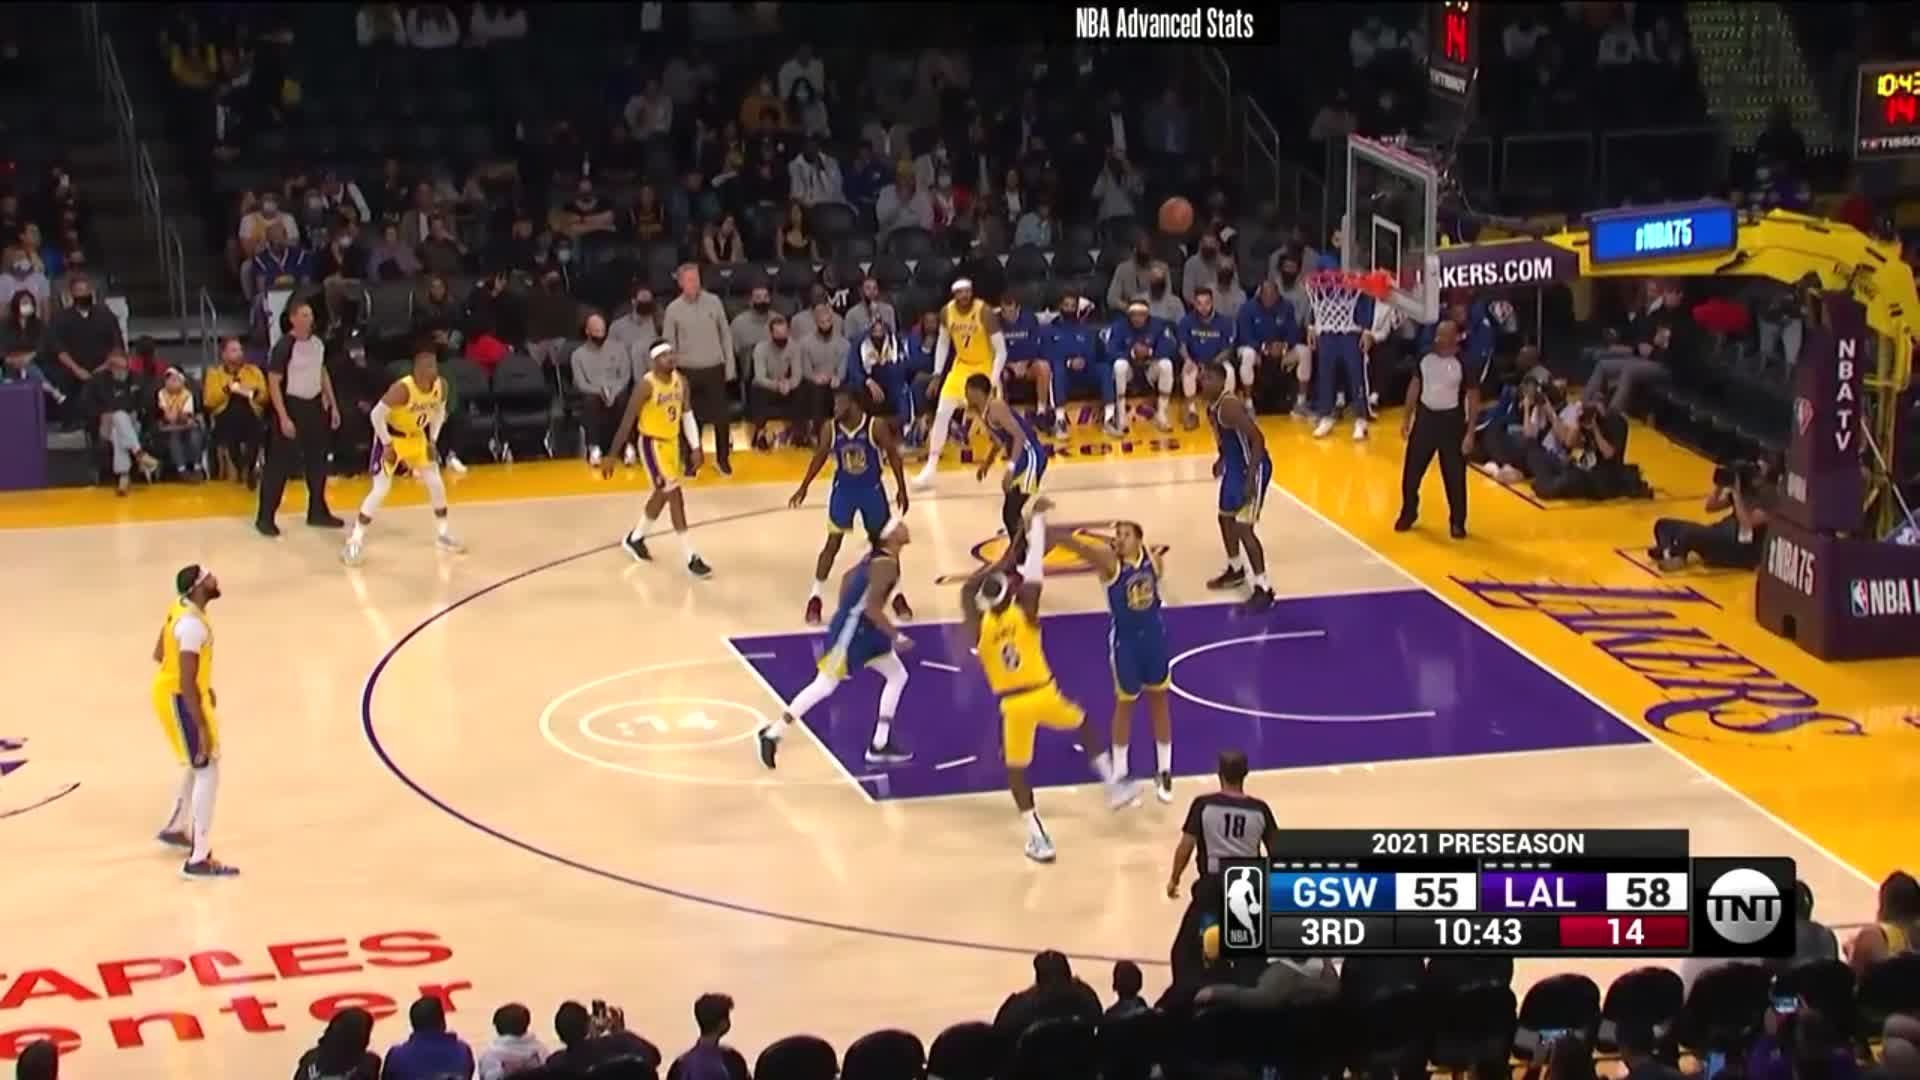 [Highlight] LeBron James executes yet another turnaround fadeaway